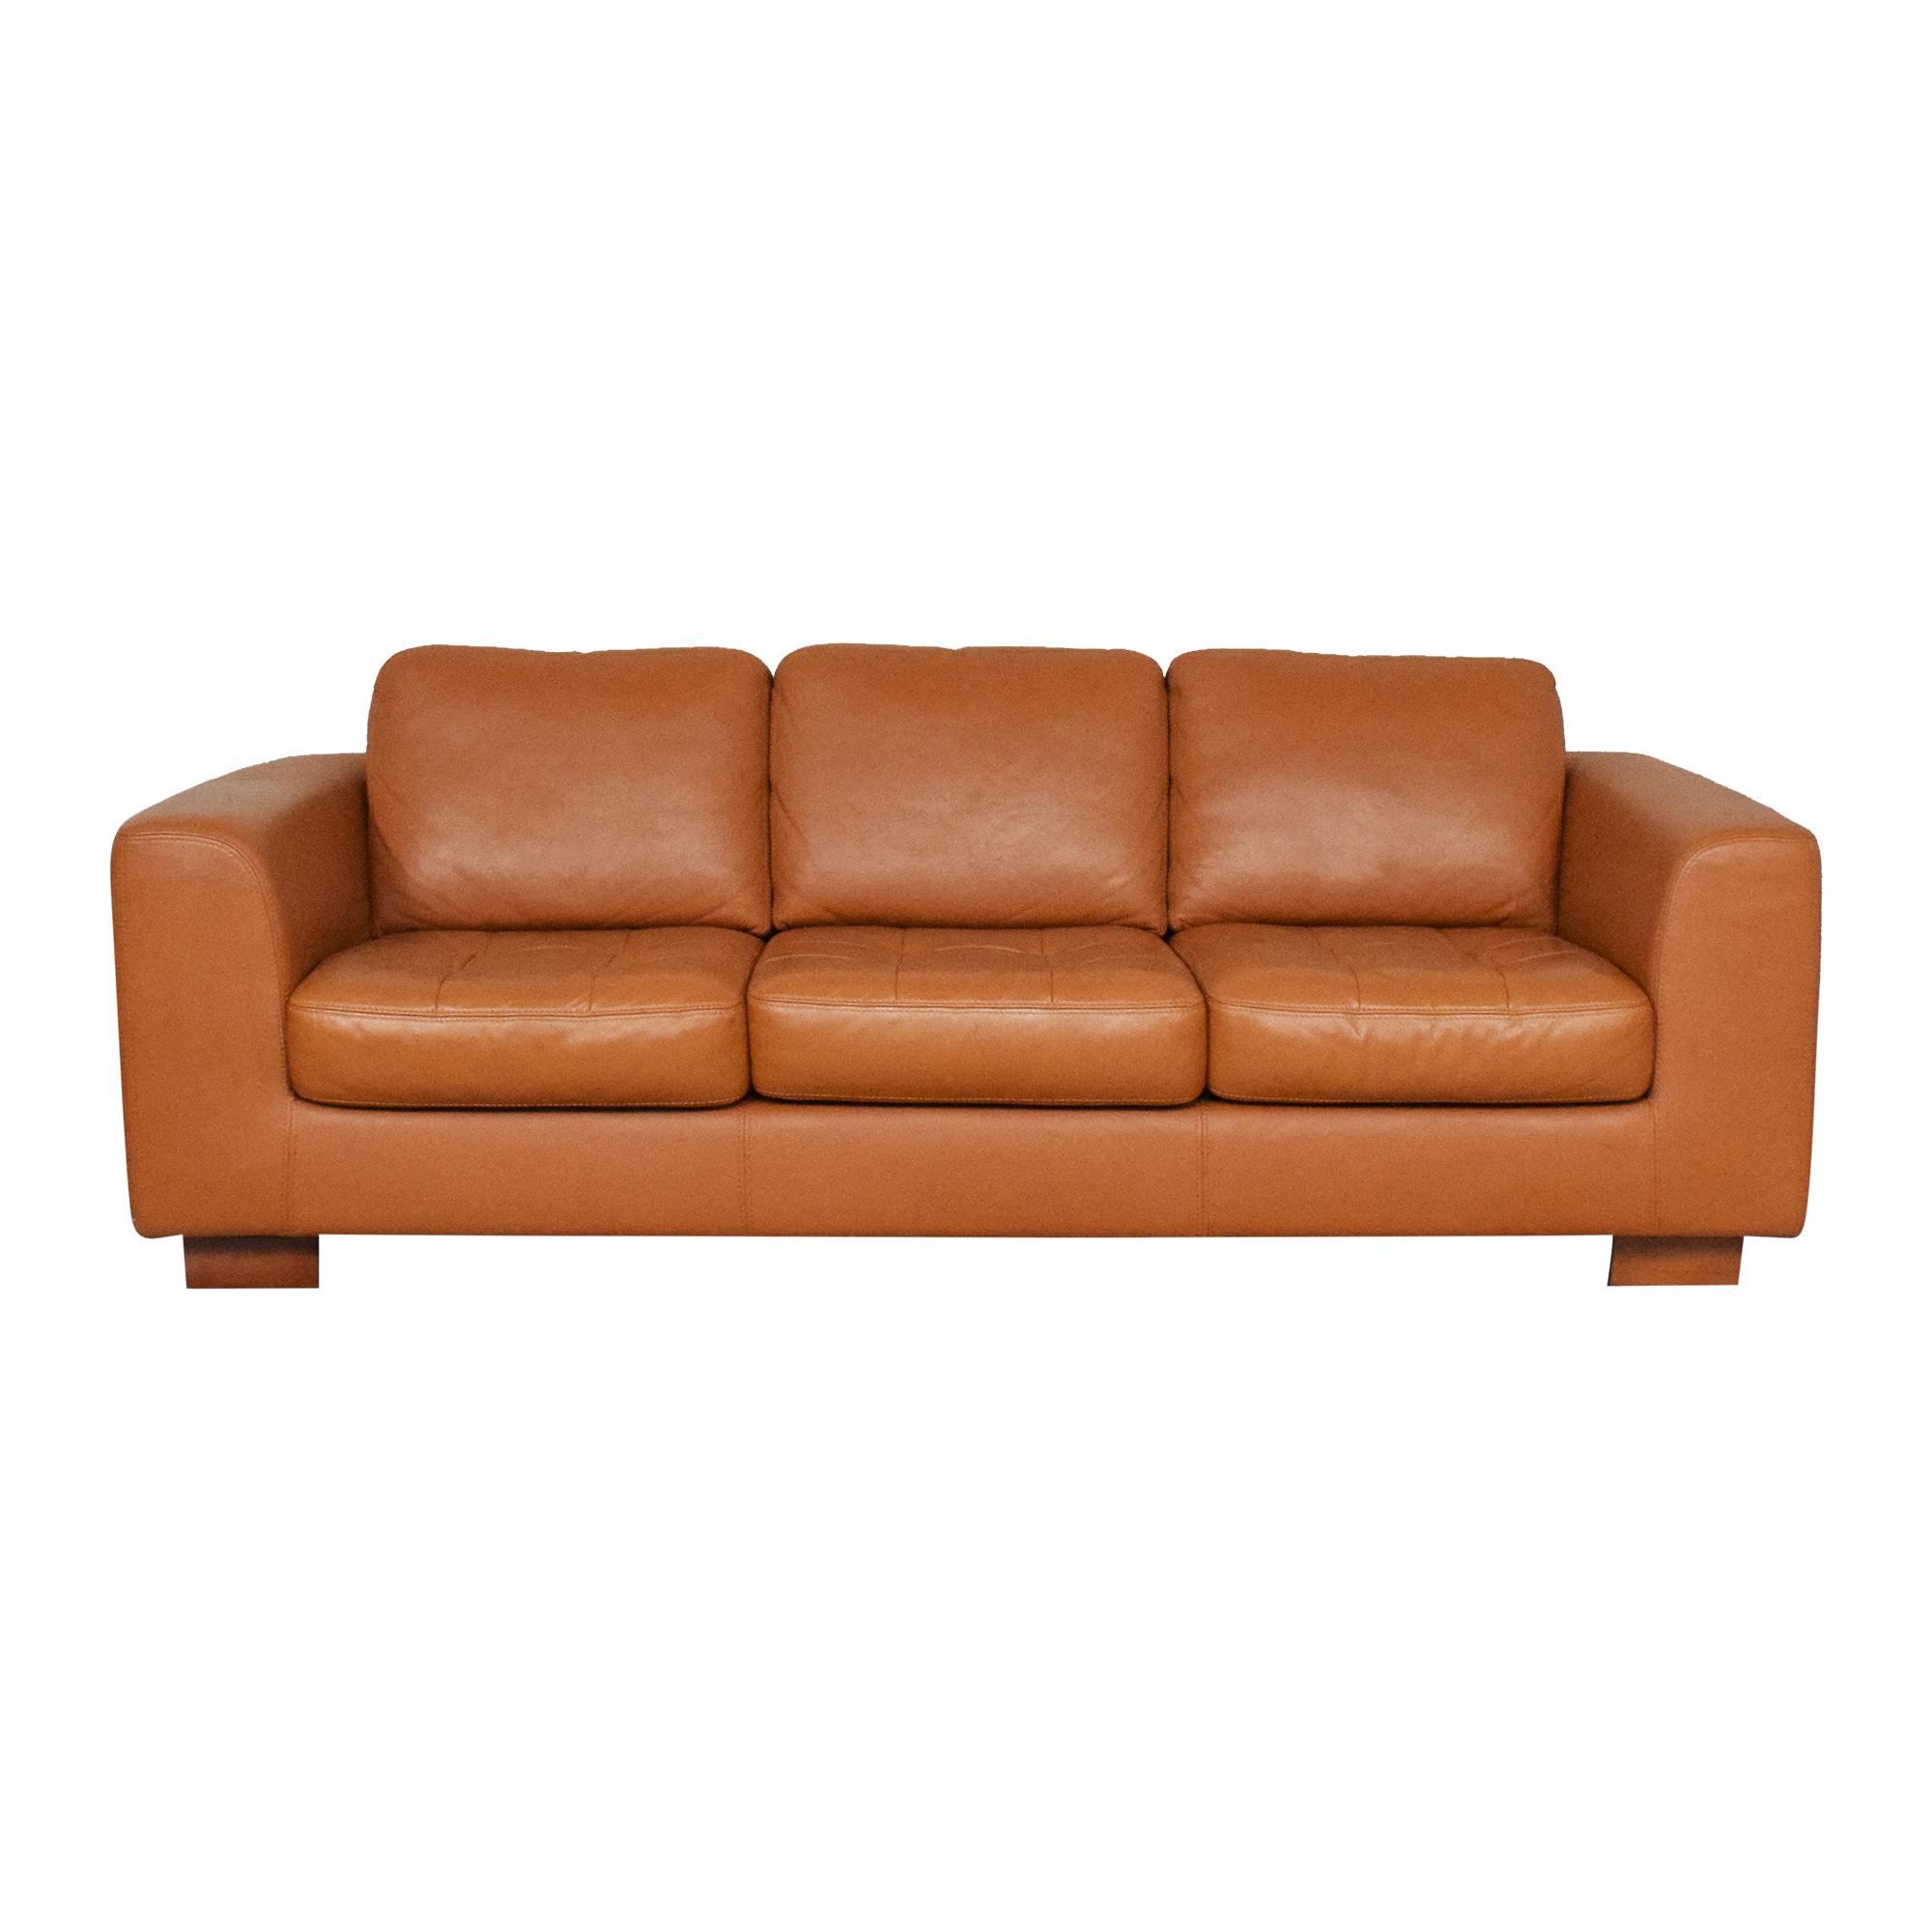 buy W. Schillig W. Schillig Three Cushion Sofa online